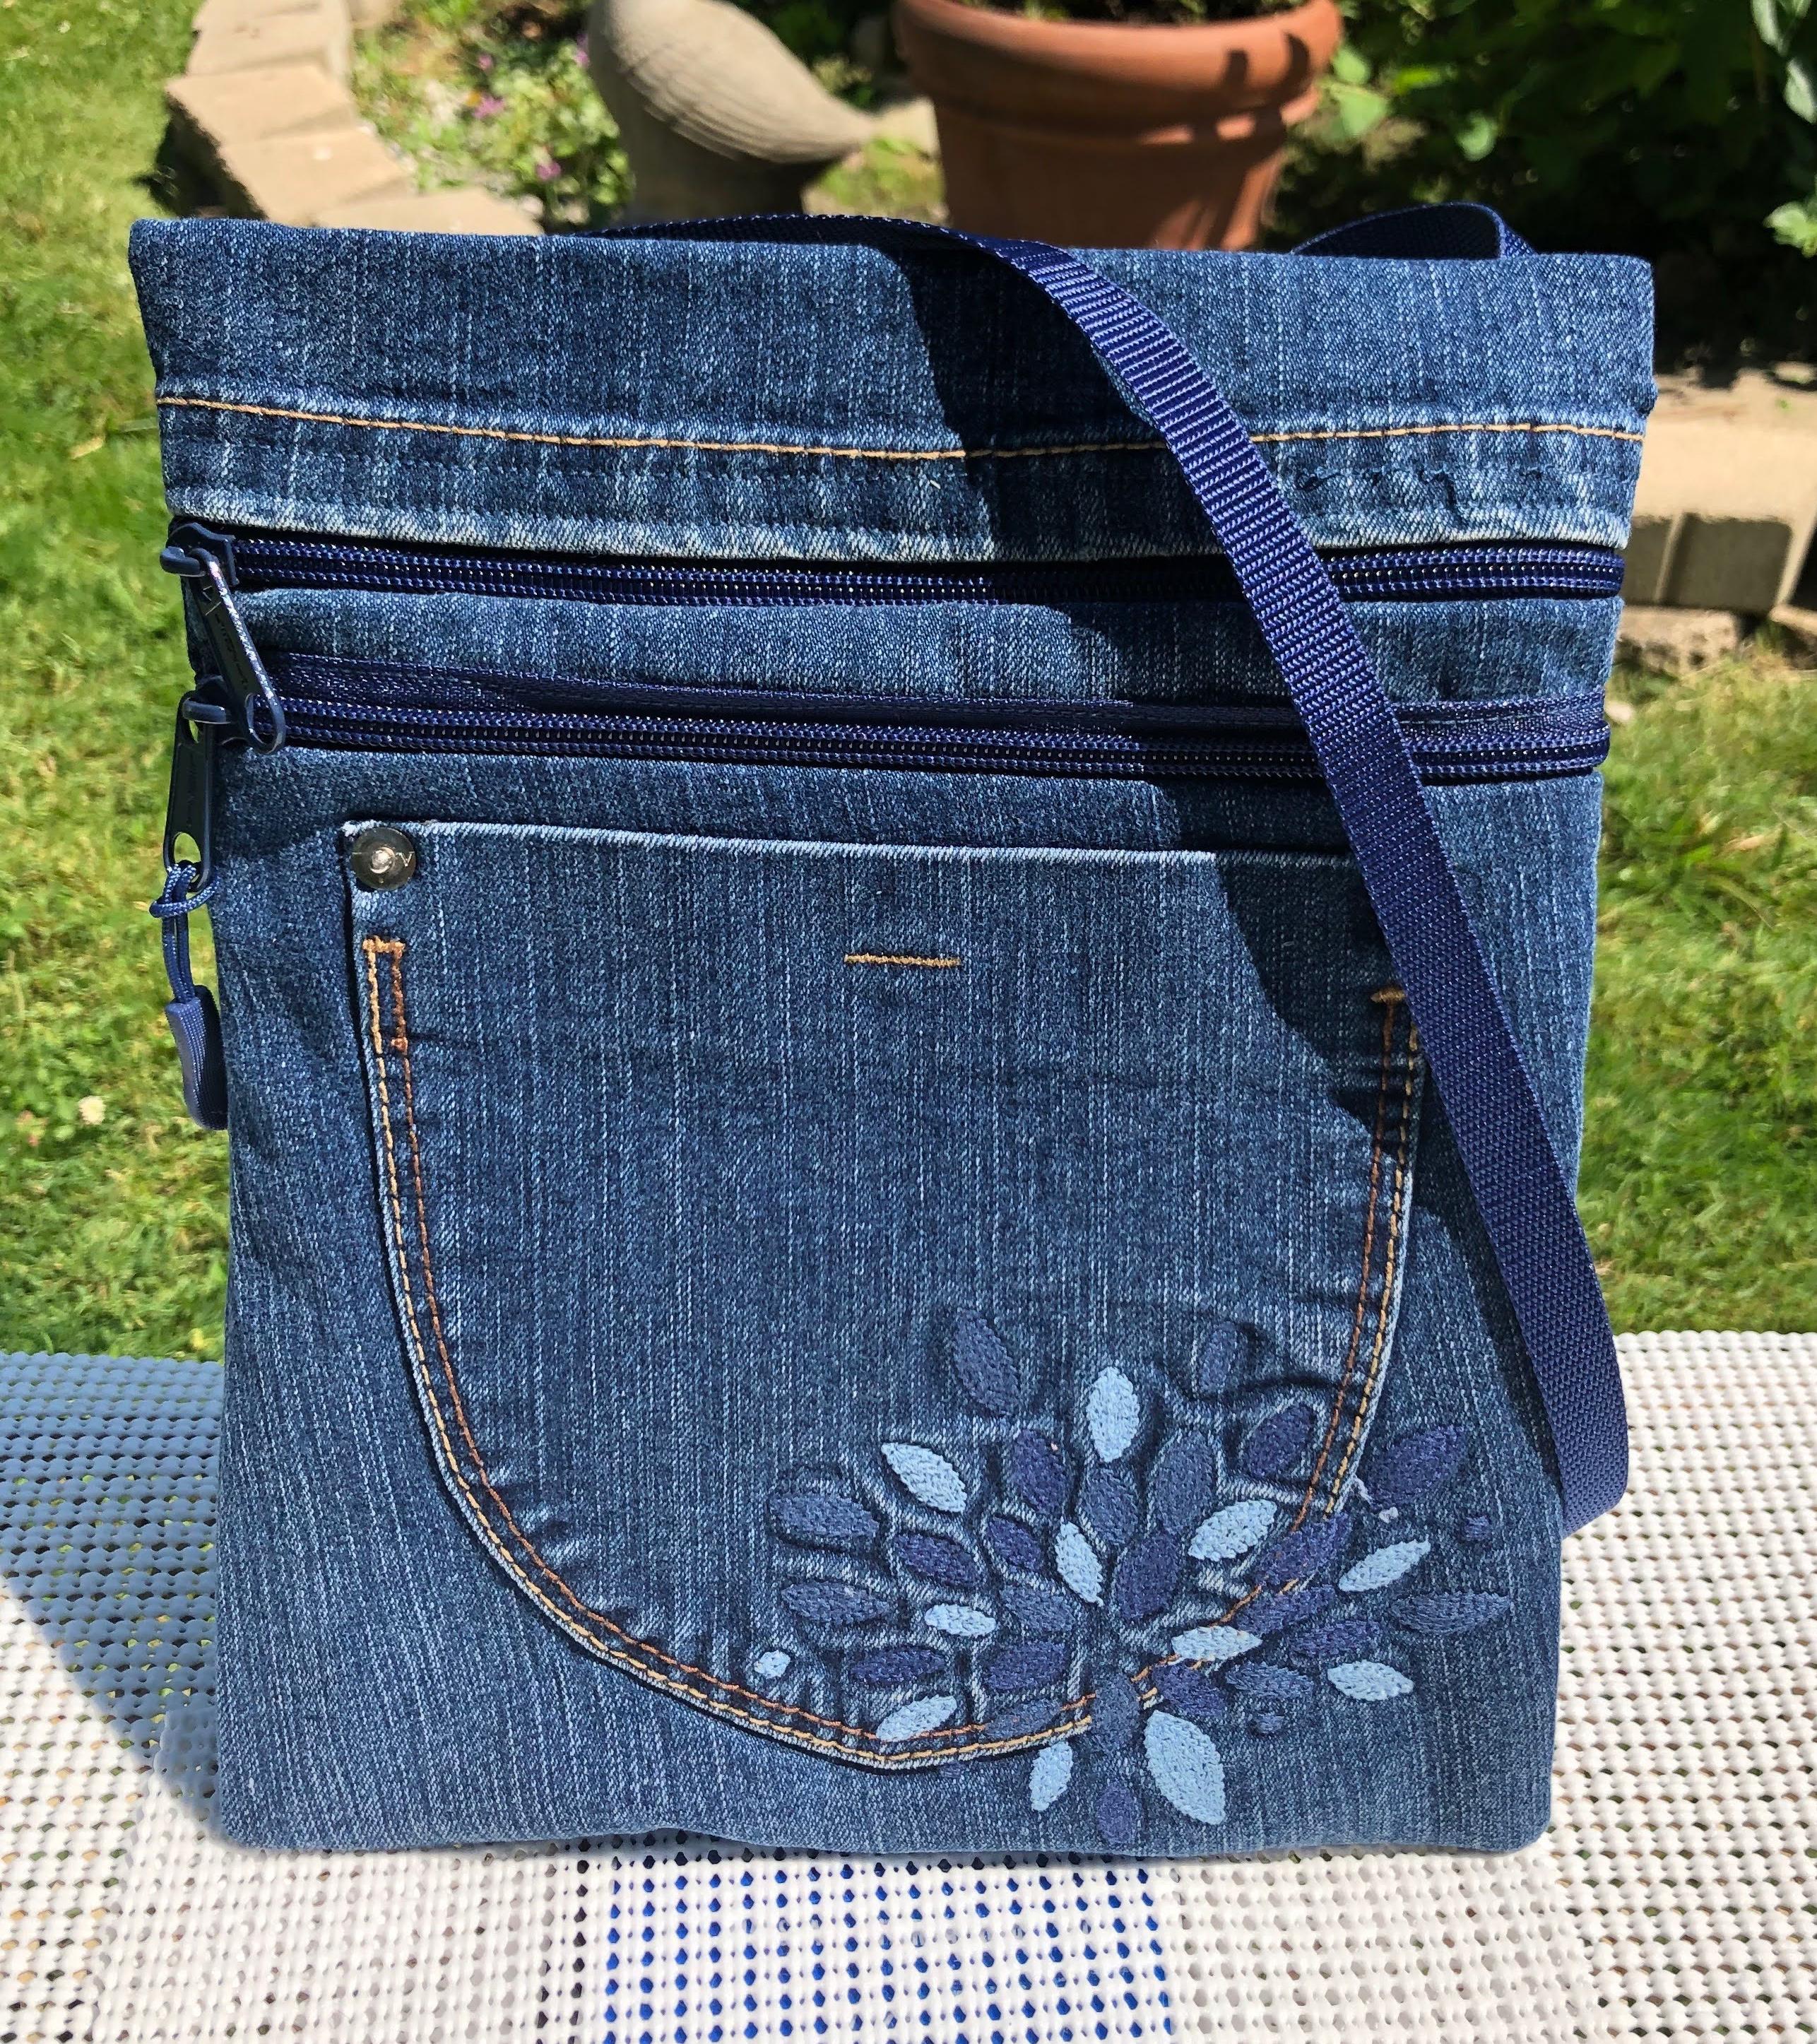 Real Jean Bags